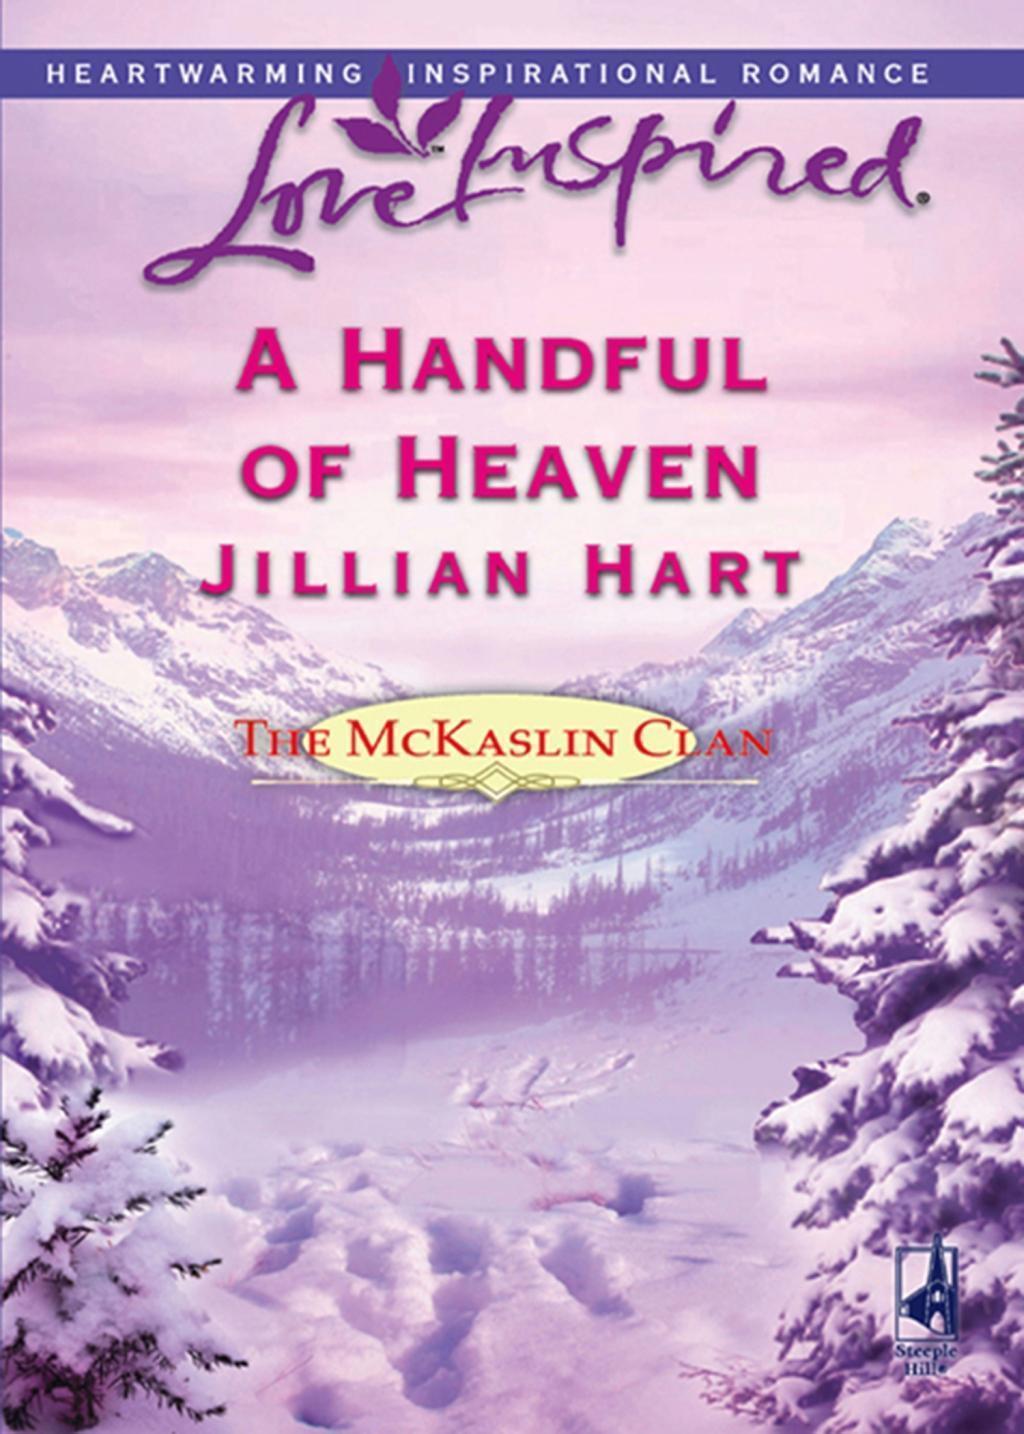 A Handful of Heaven (Mills & Boon Love Inspired) (The McKaslin Clan, Book 4)